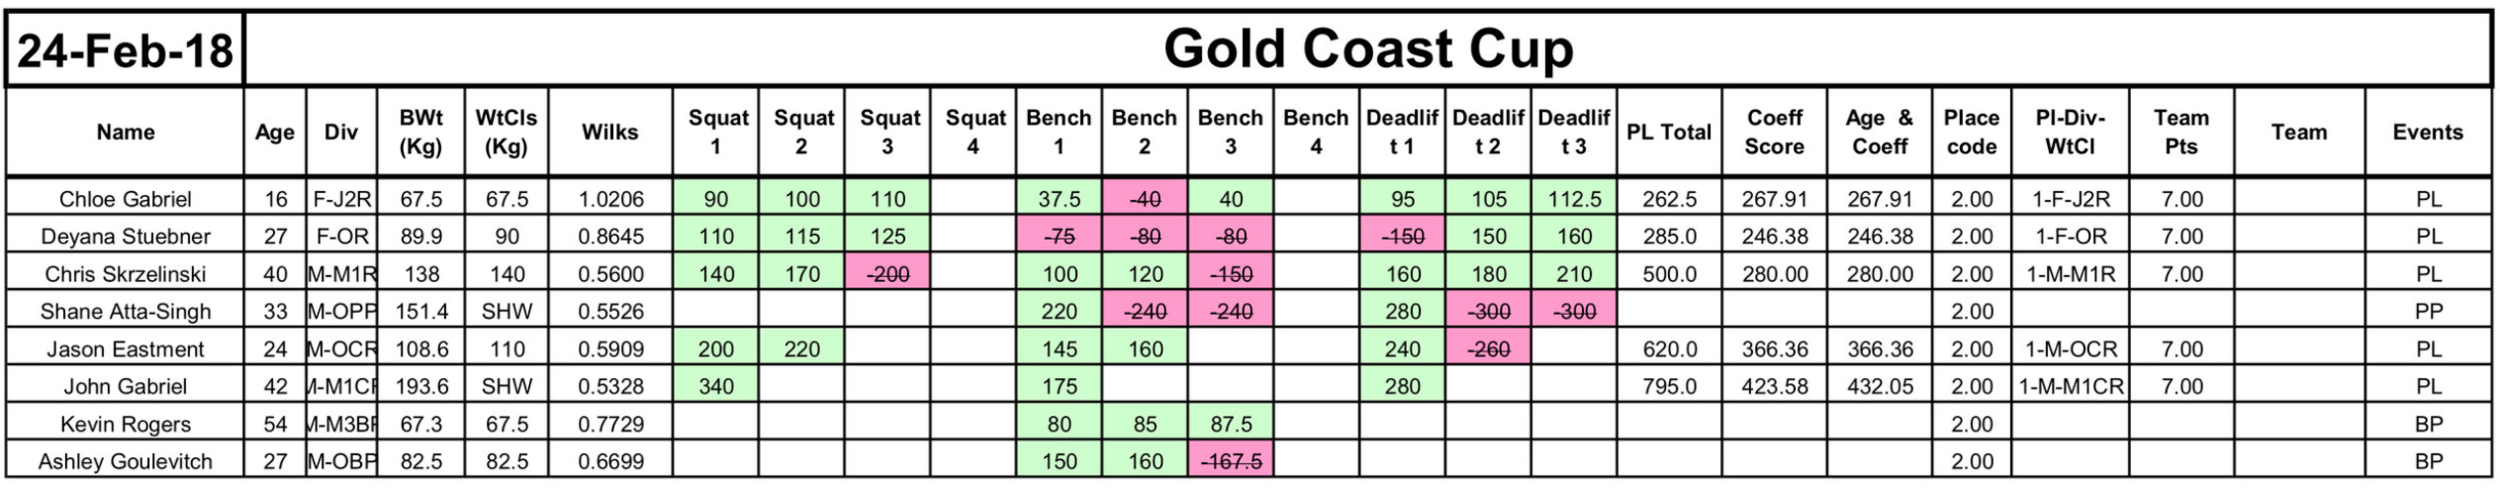 Gold Coast Cup 2018